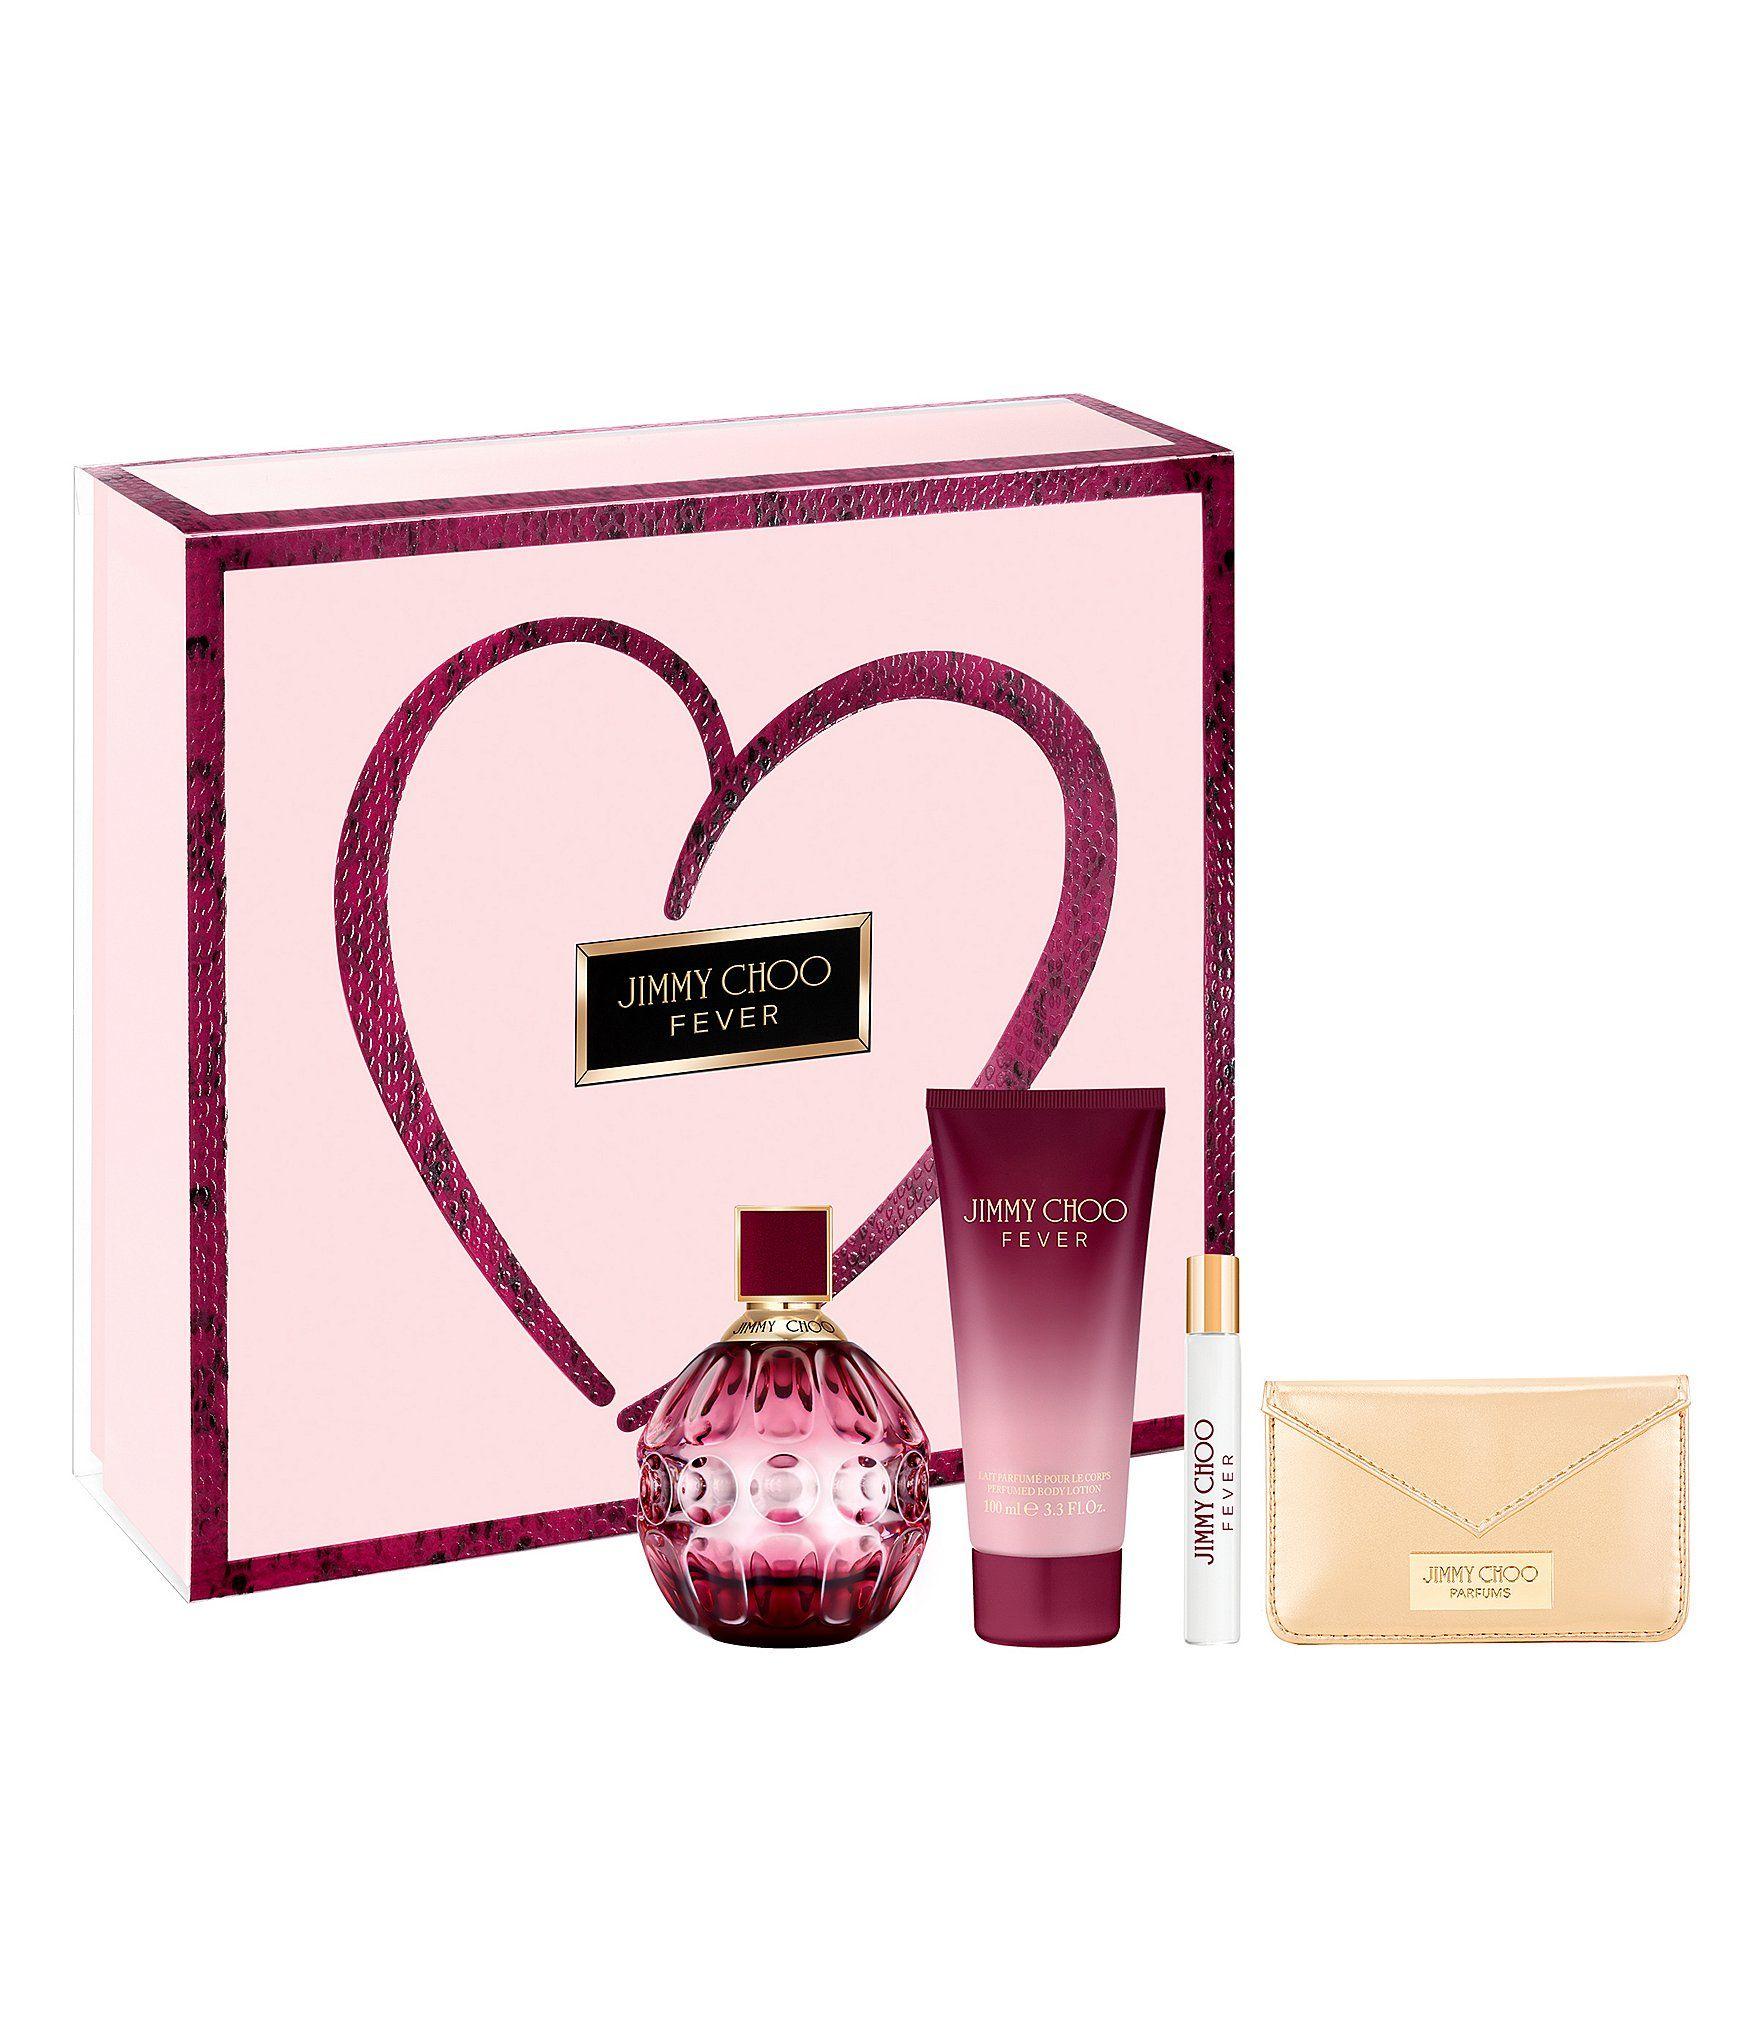 Jimmy Choo Fever Eau de Parfum Gift Set N/A N/A Jimmy